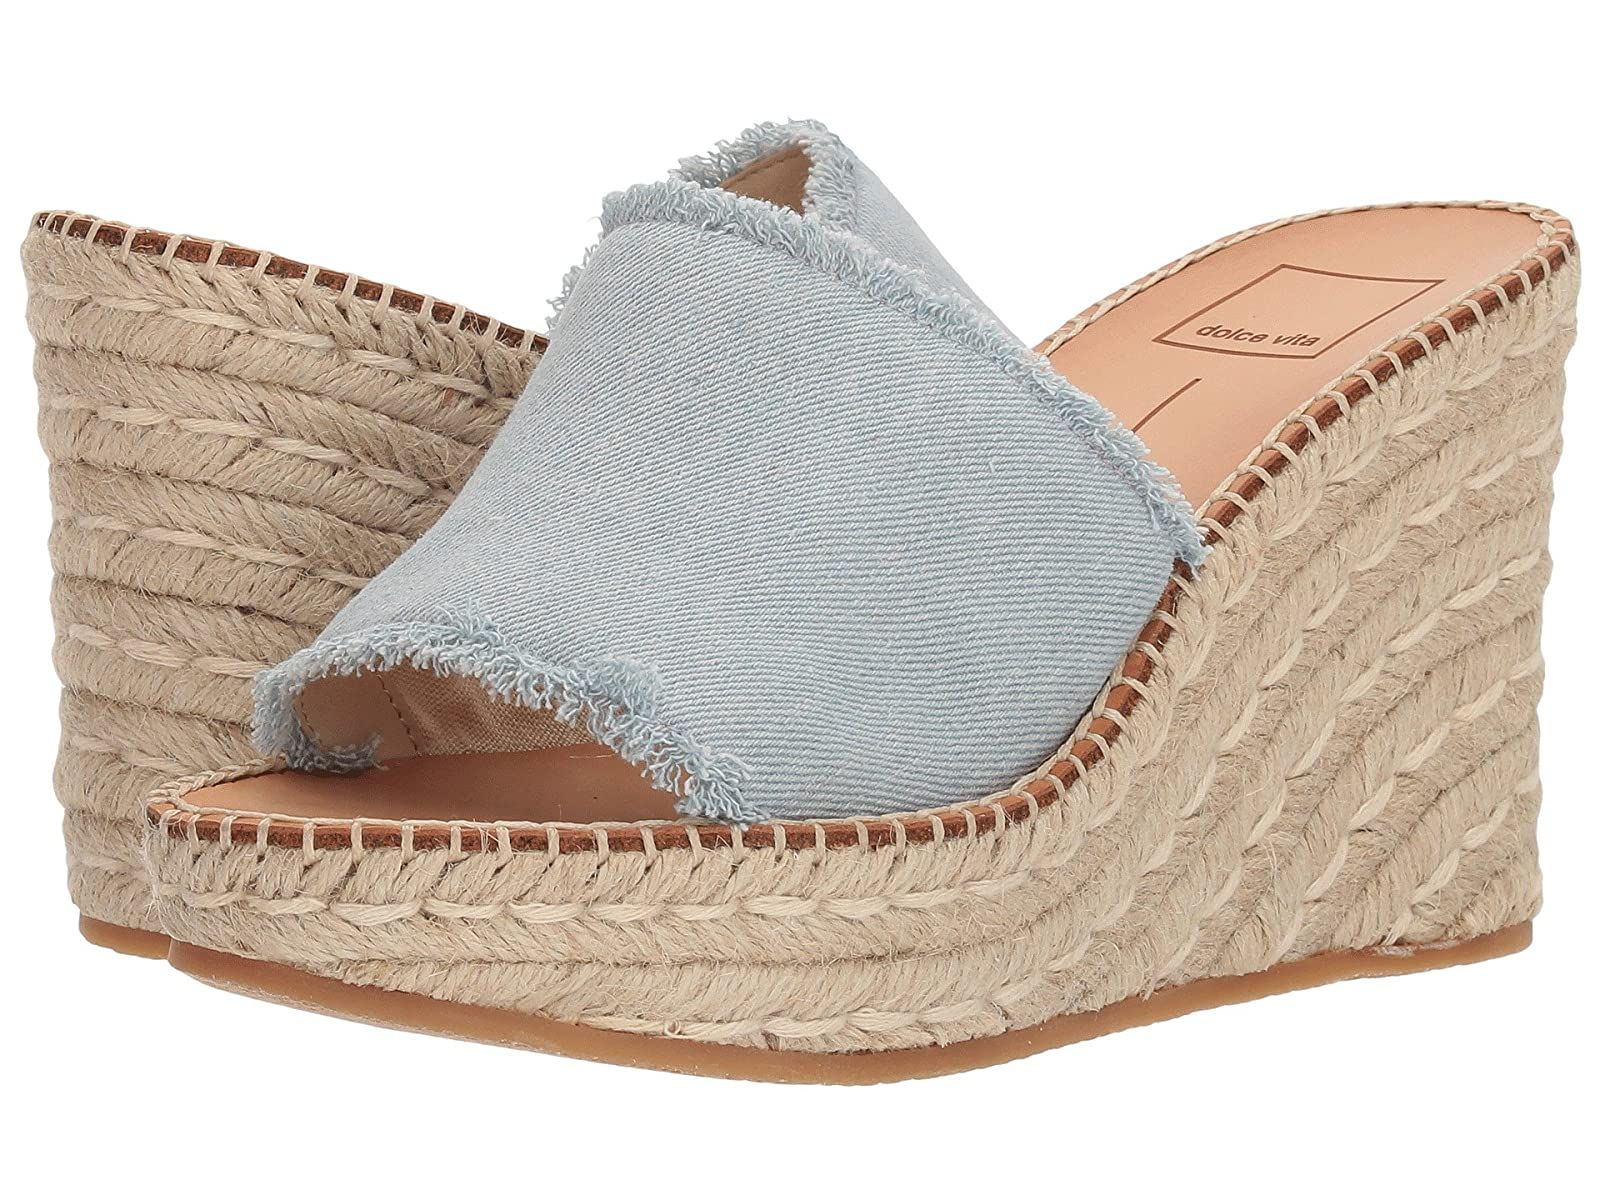 Dolce Vita PimAtmospheric grades have affordable shoes